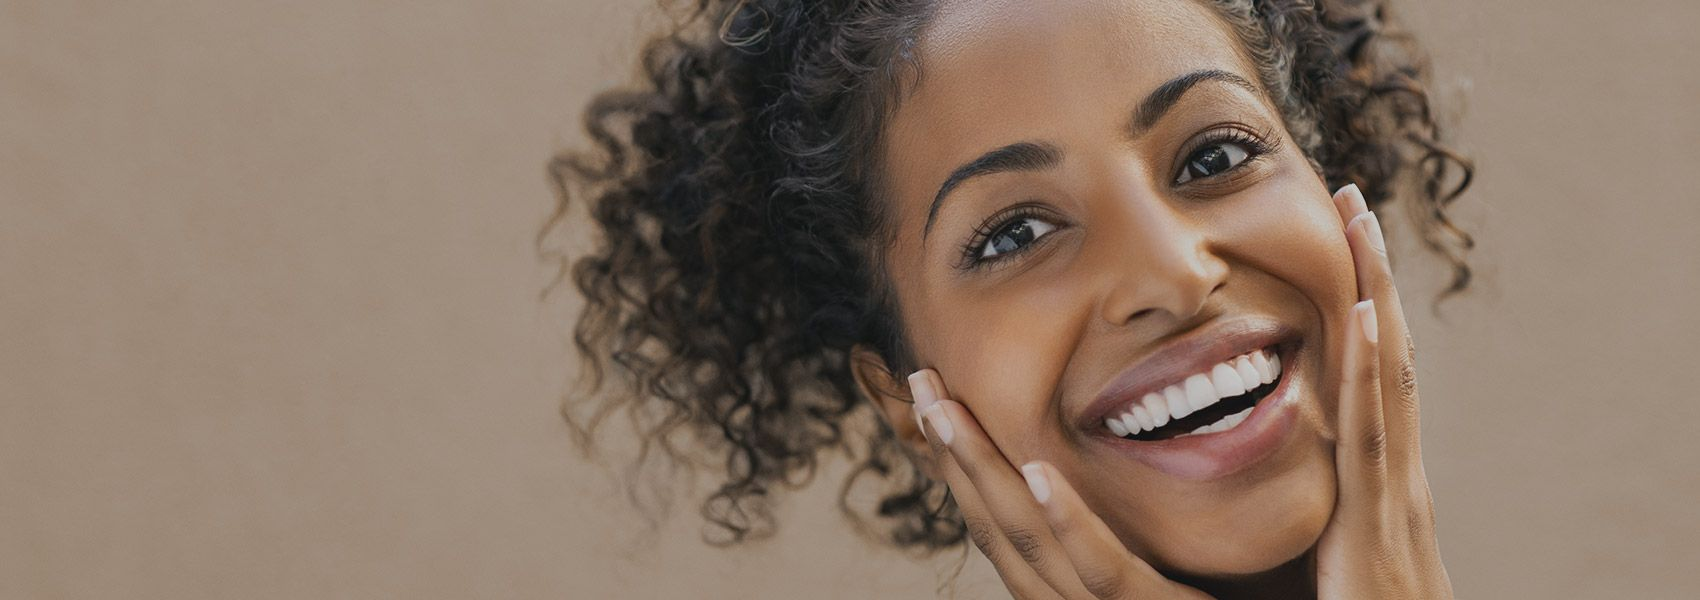 Periodontal Therapy - Distinctive Dentistry